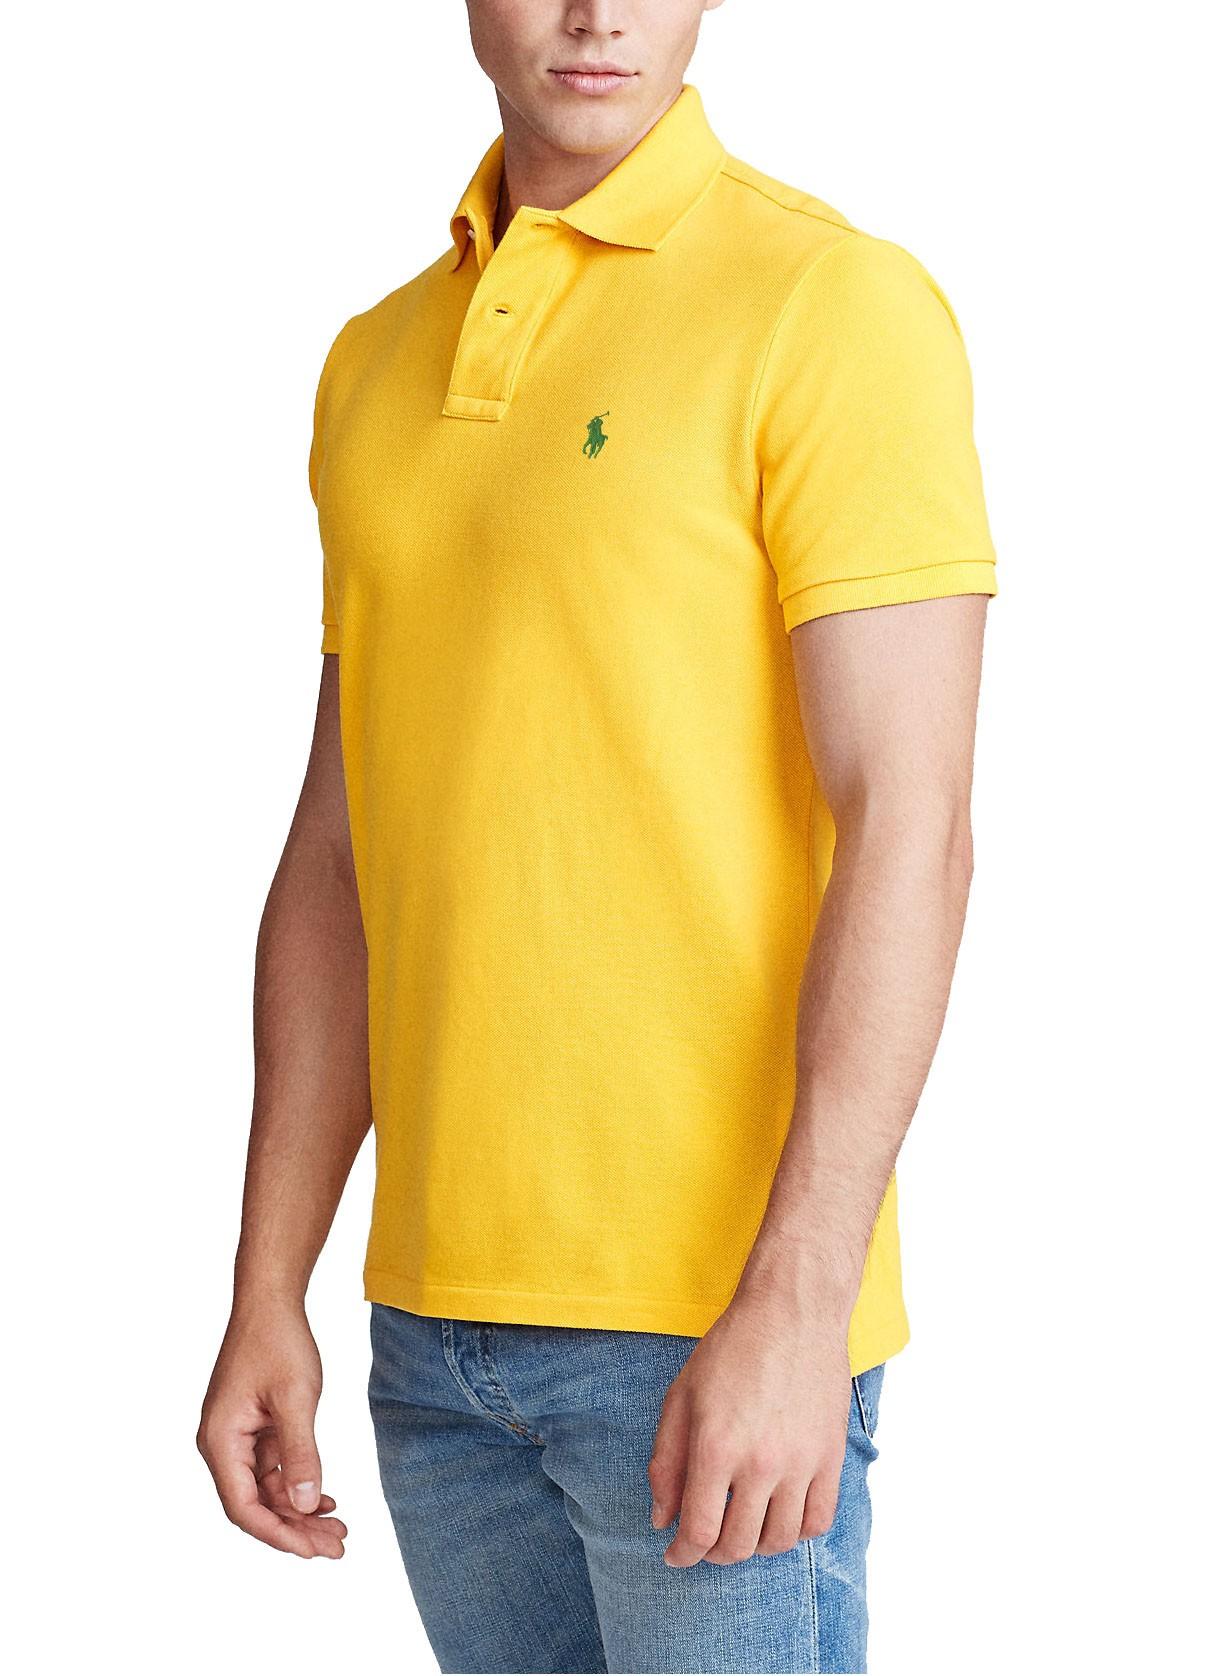 Polo Ralph Lauren Masculina Custom Fit Small Pony Verde Amarelo